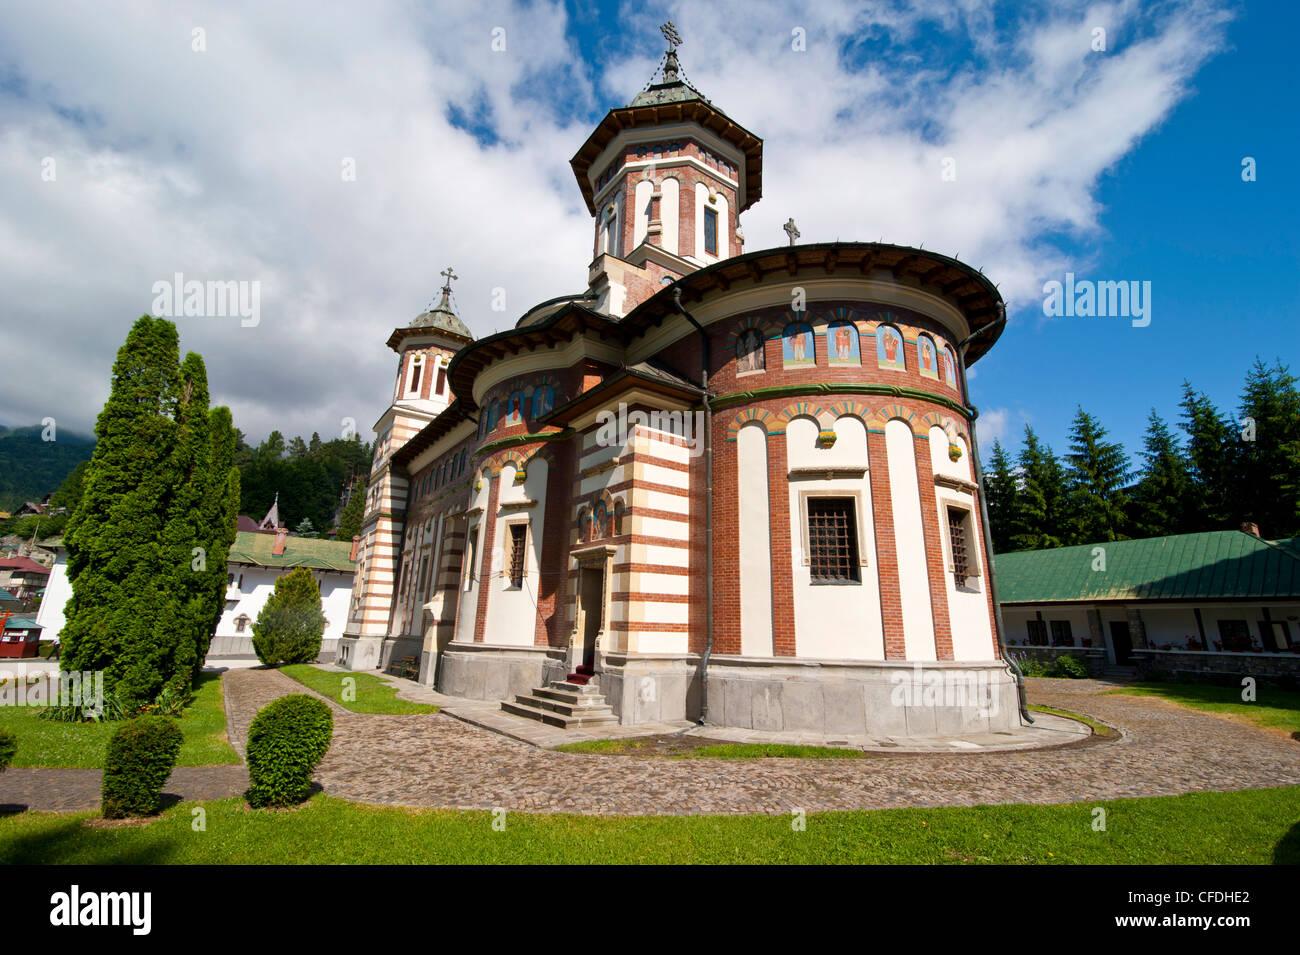 The Sinaia Monastery was founded by Prince Mihai Cantacuzino in 1695, Sinaia, Romania, Europe - Stock Image